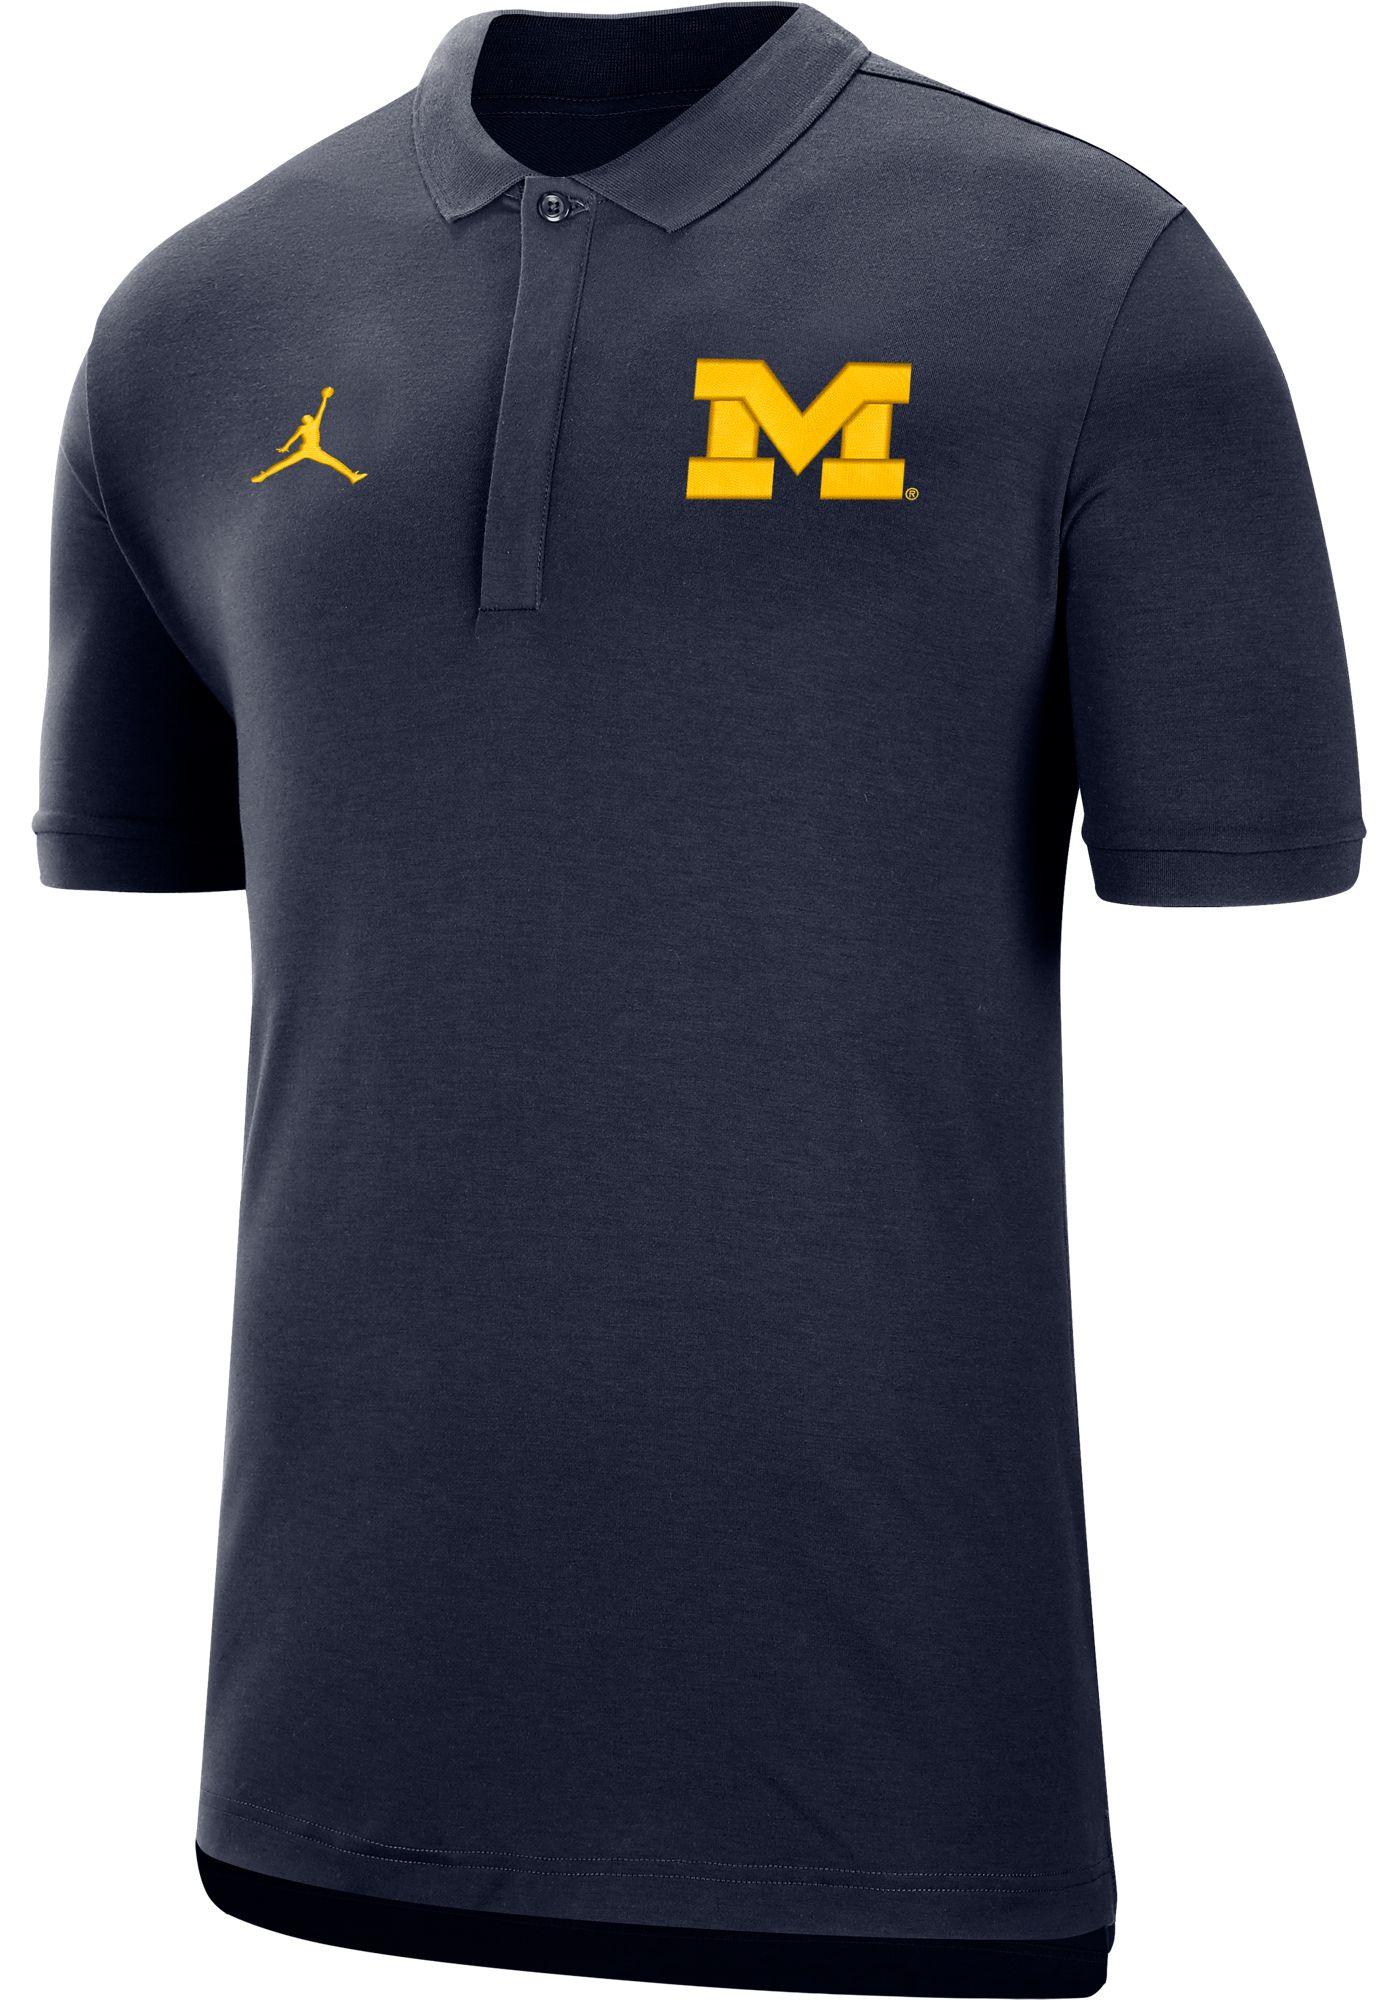 Jordan Men's Michigan Wolverines Blue Dri-FIT Elite Football Sideline Polo